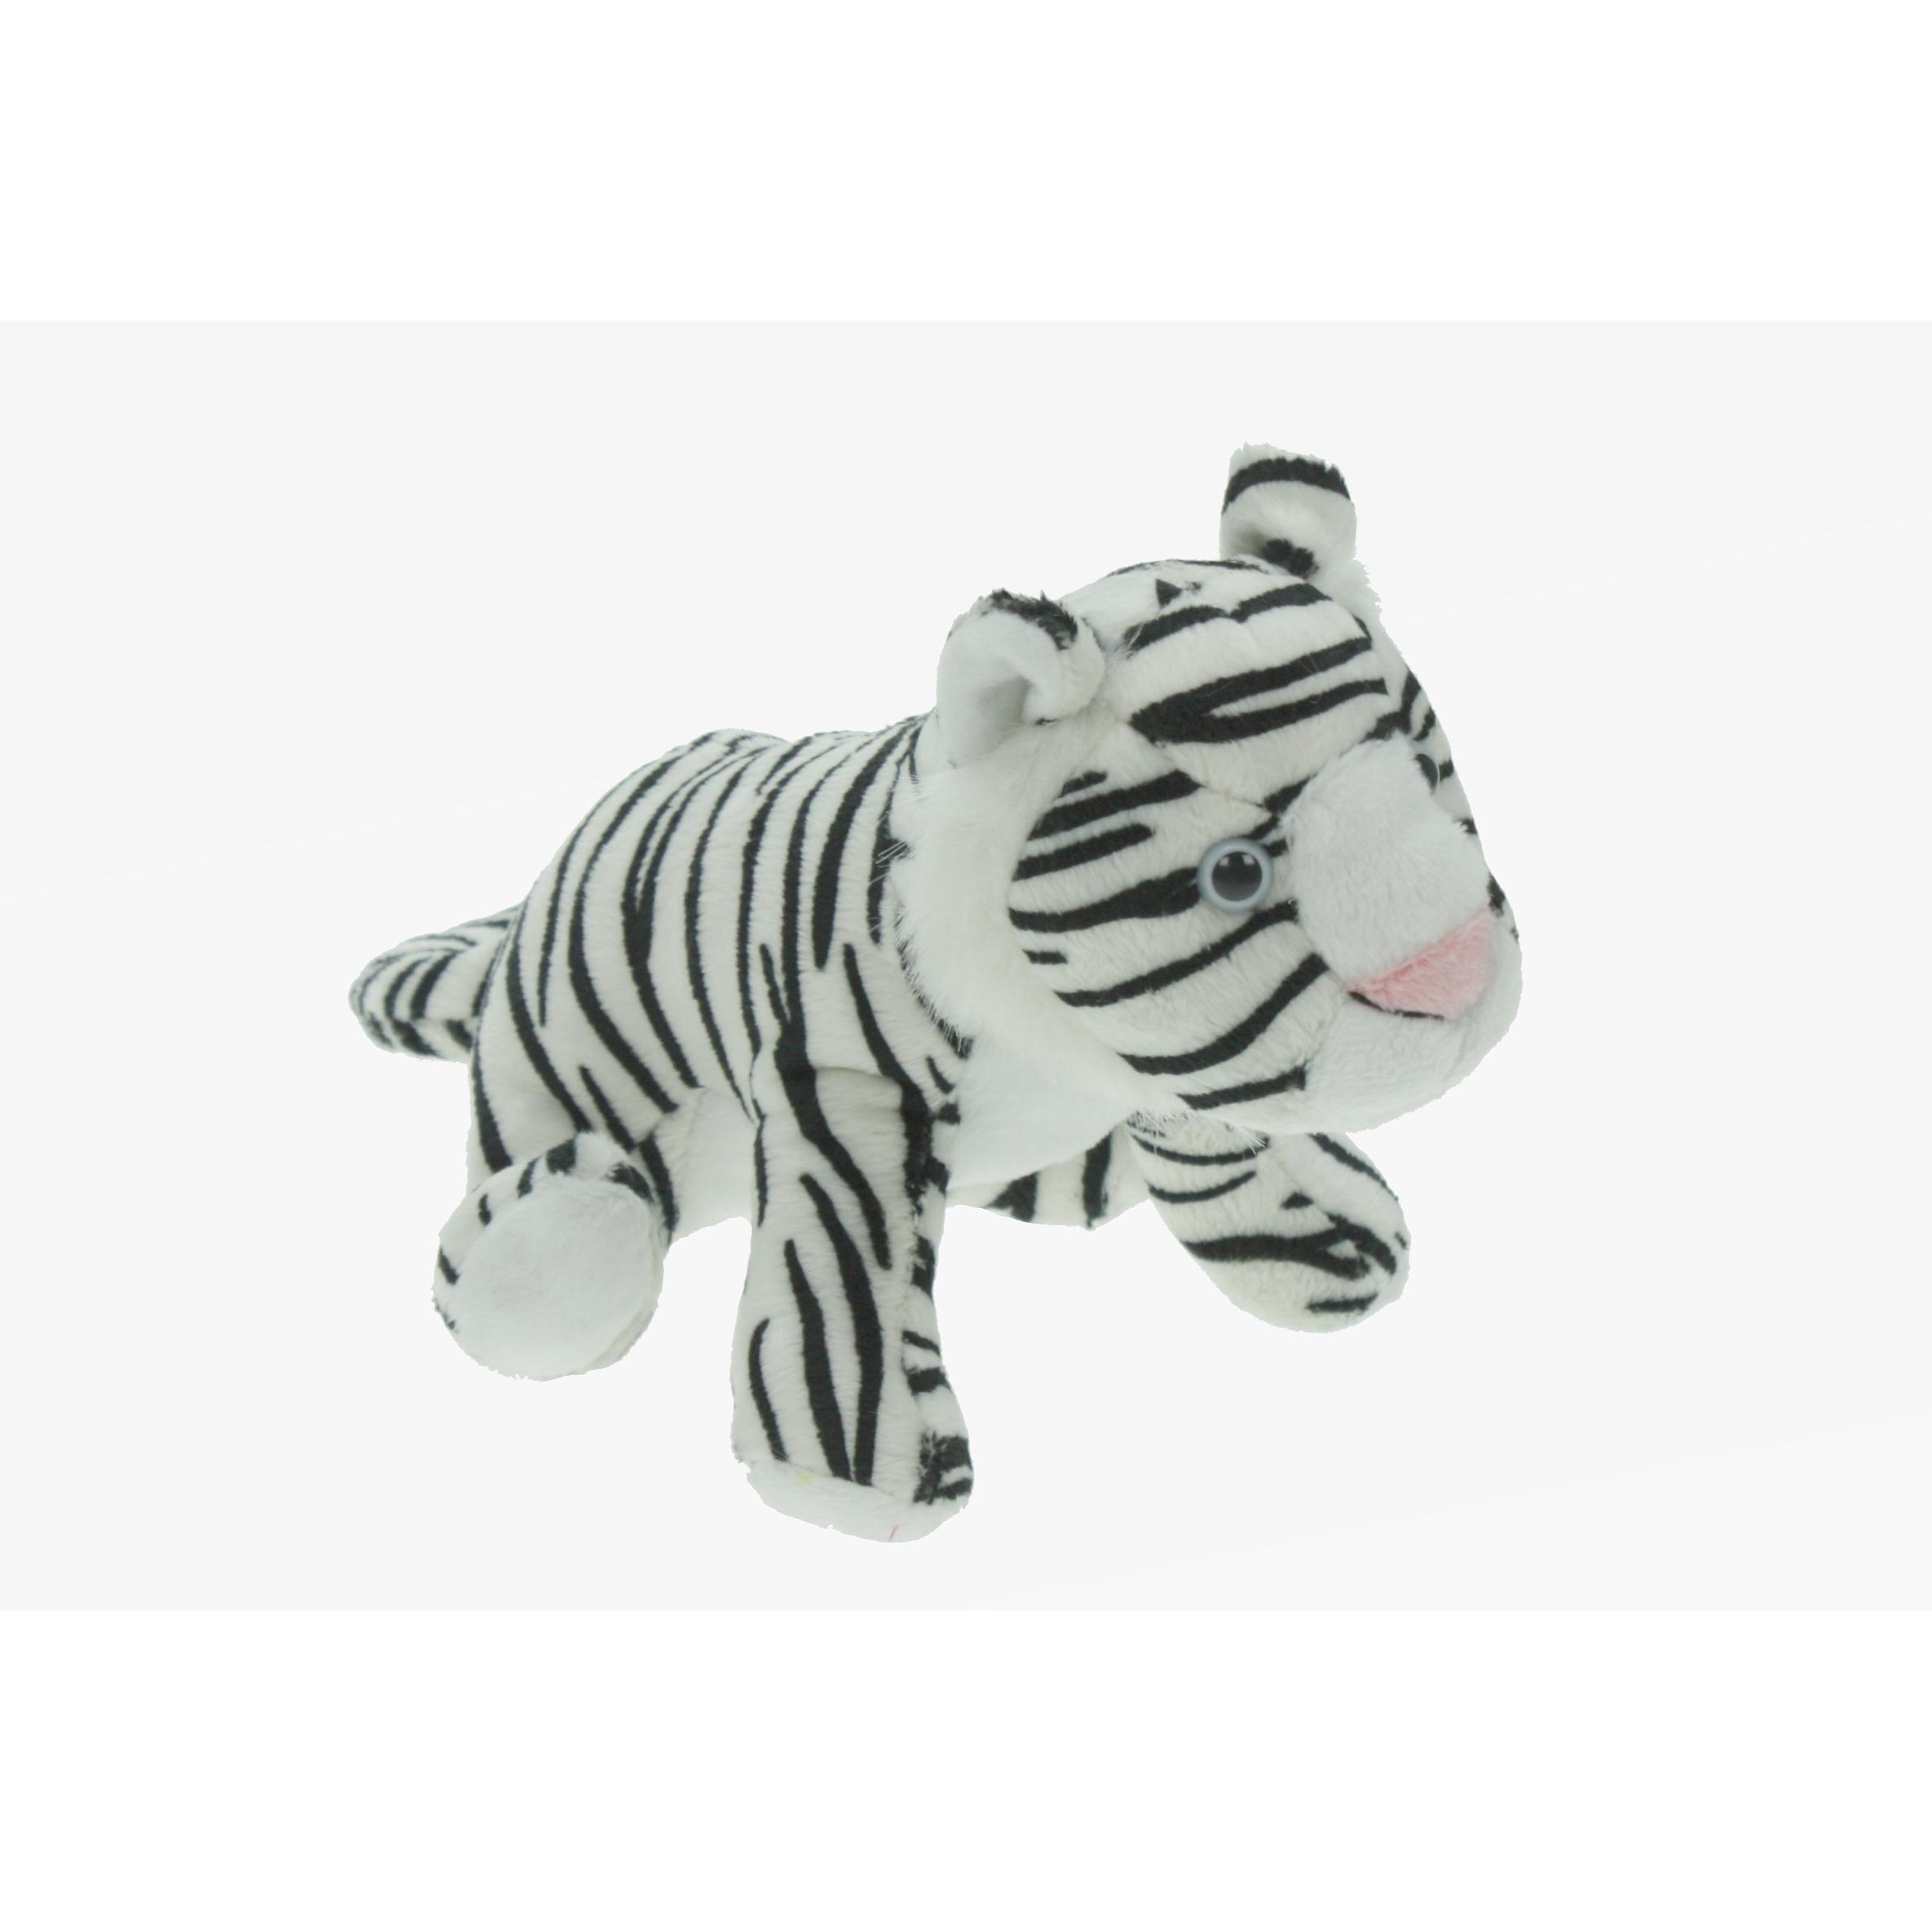 Pluche tijger knuffeldier wit 23 cm speelgoed